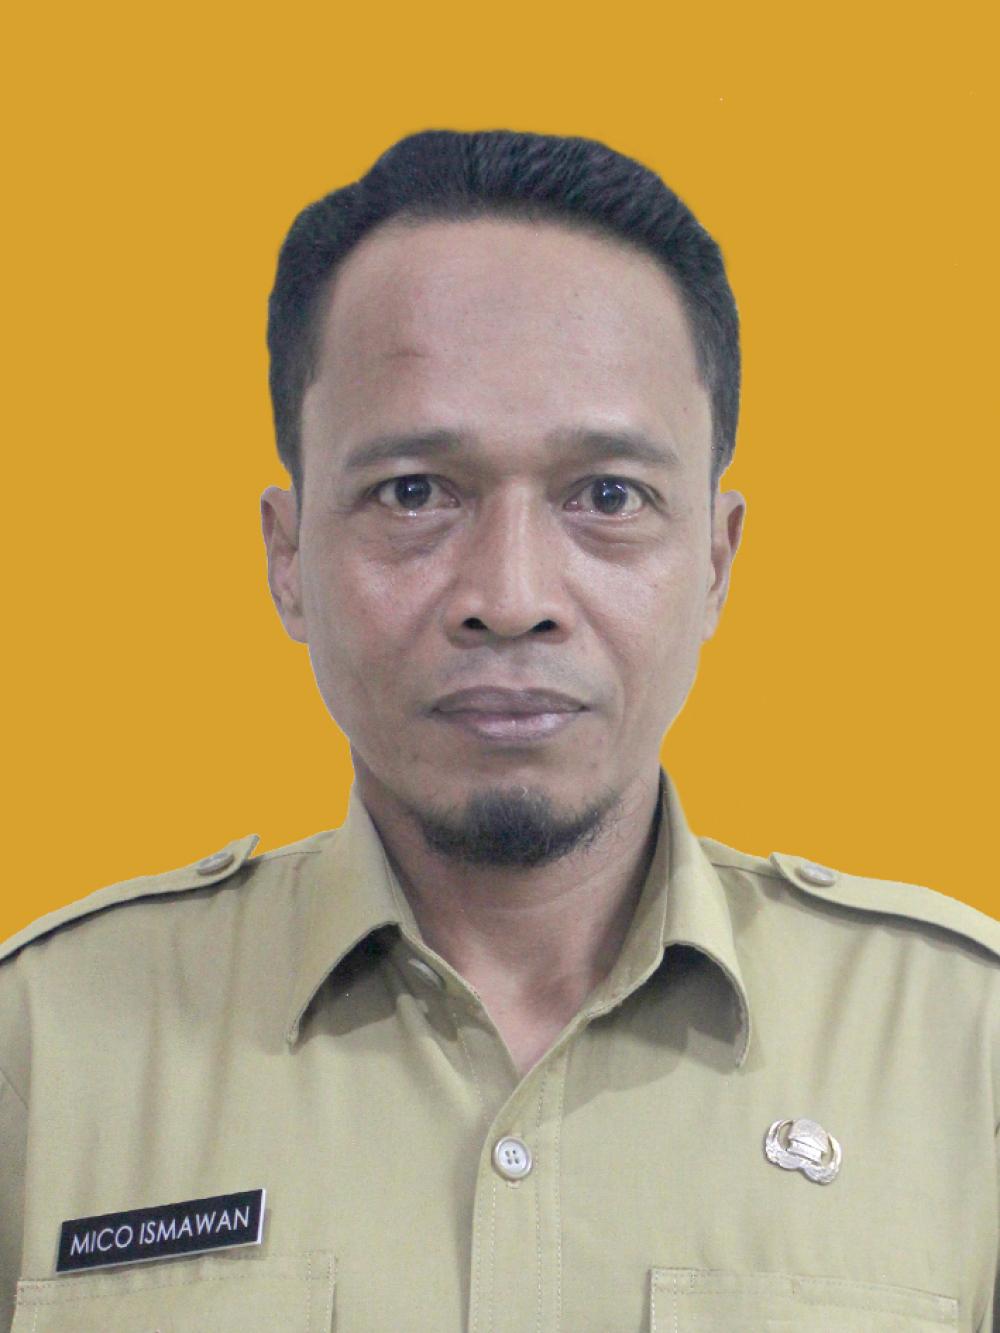 Foto Mico Iswawan